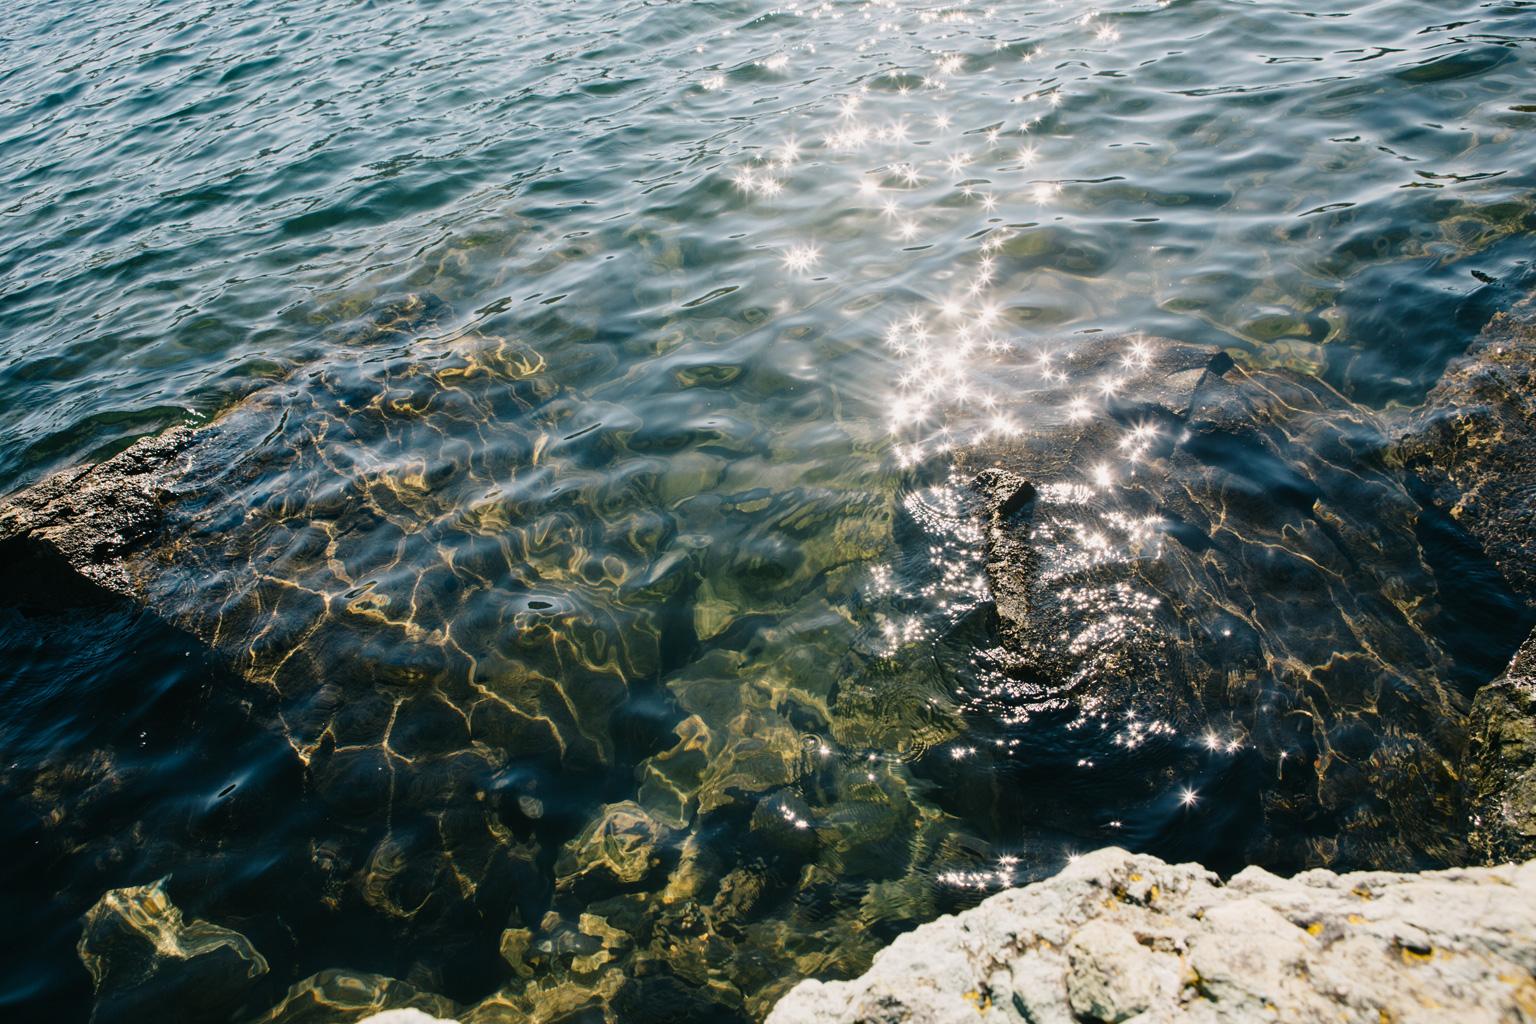 CindyGiovagnoli_outdoors_photographer_Sierra_Buttes_firetower_watchtower_Sardine_Snag_Bear_lake_hike_swim_camp-060.jpg